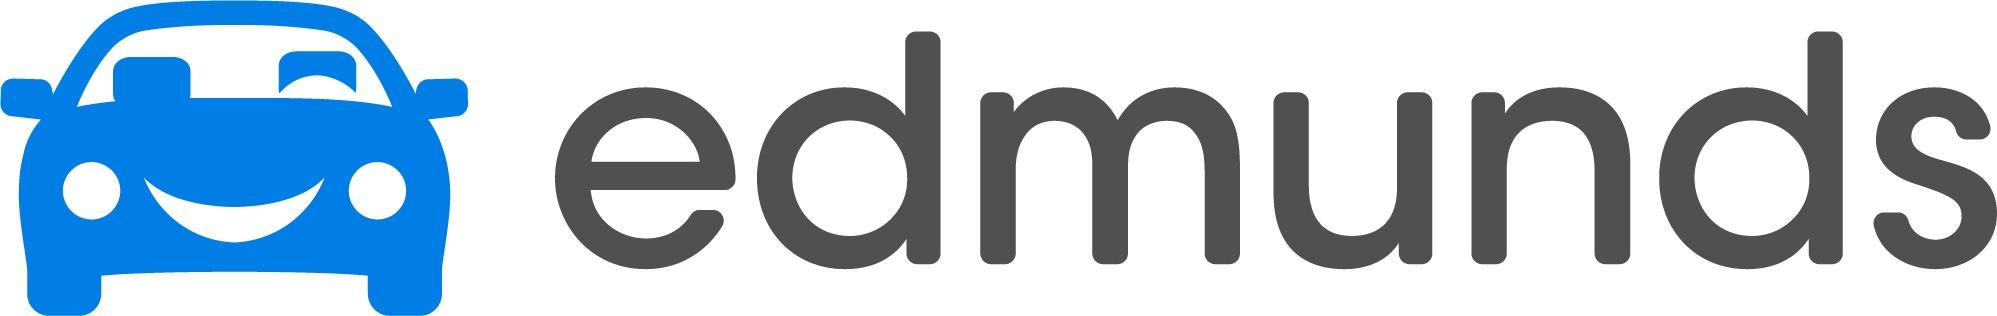 Color Logo Horizontal.jpg